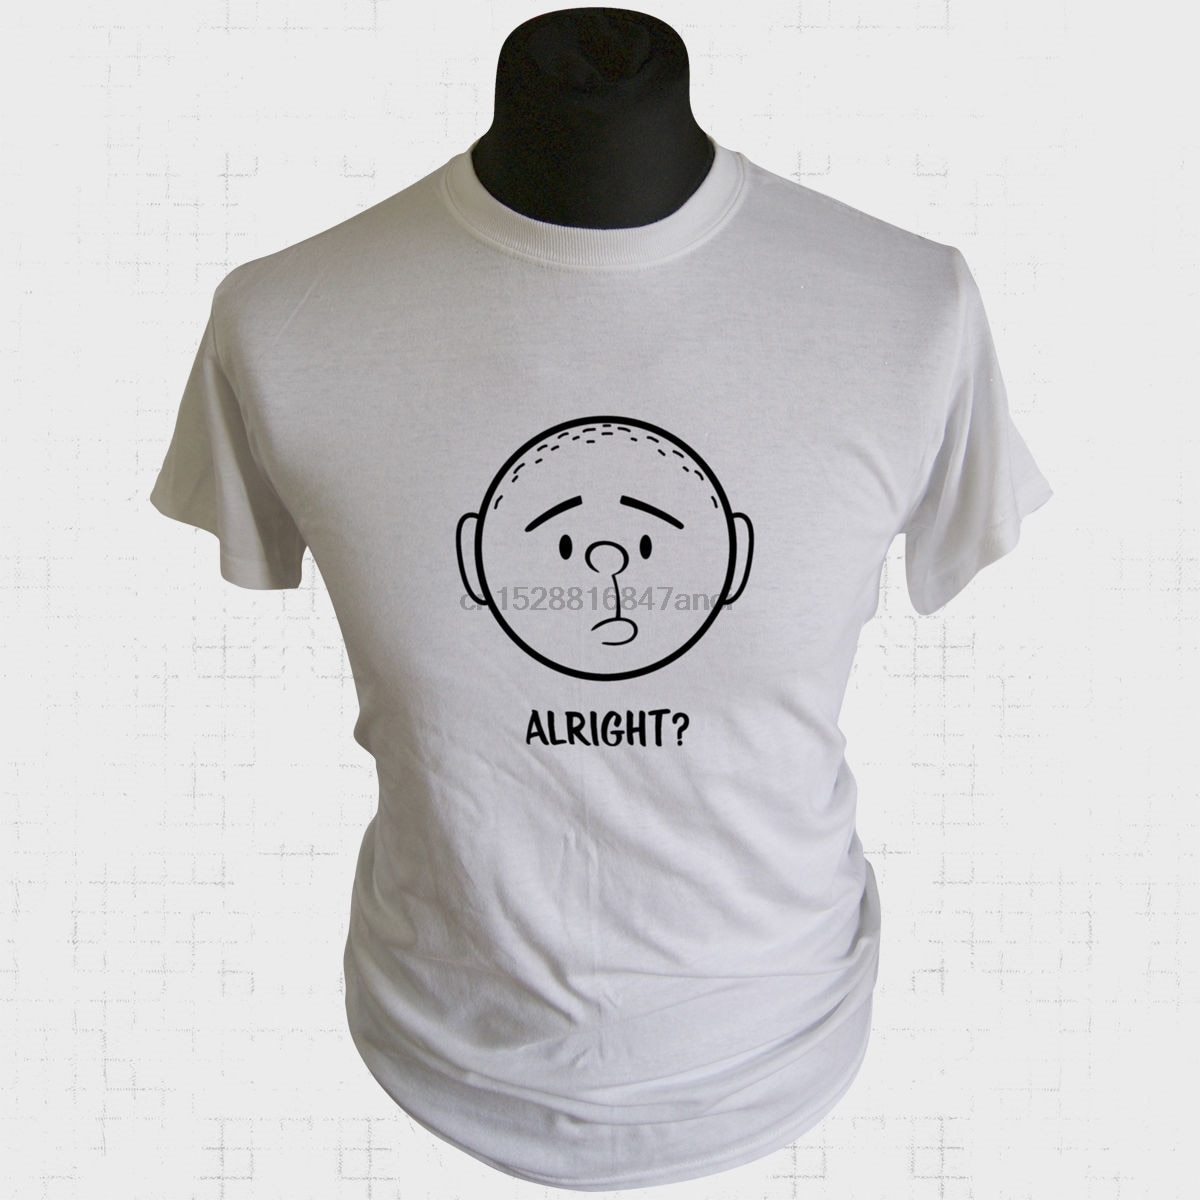 Karl Pilkington bien T camisa Ricky Gervais idiota en el extranjero broma divertida Tee nuevo divertido T camisas Tops camiseta nueva Unisex Tops